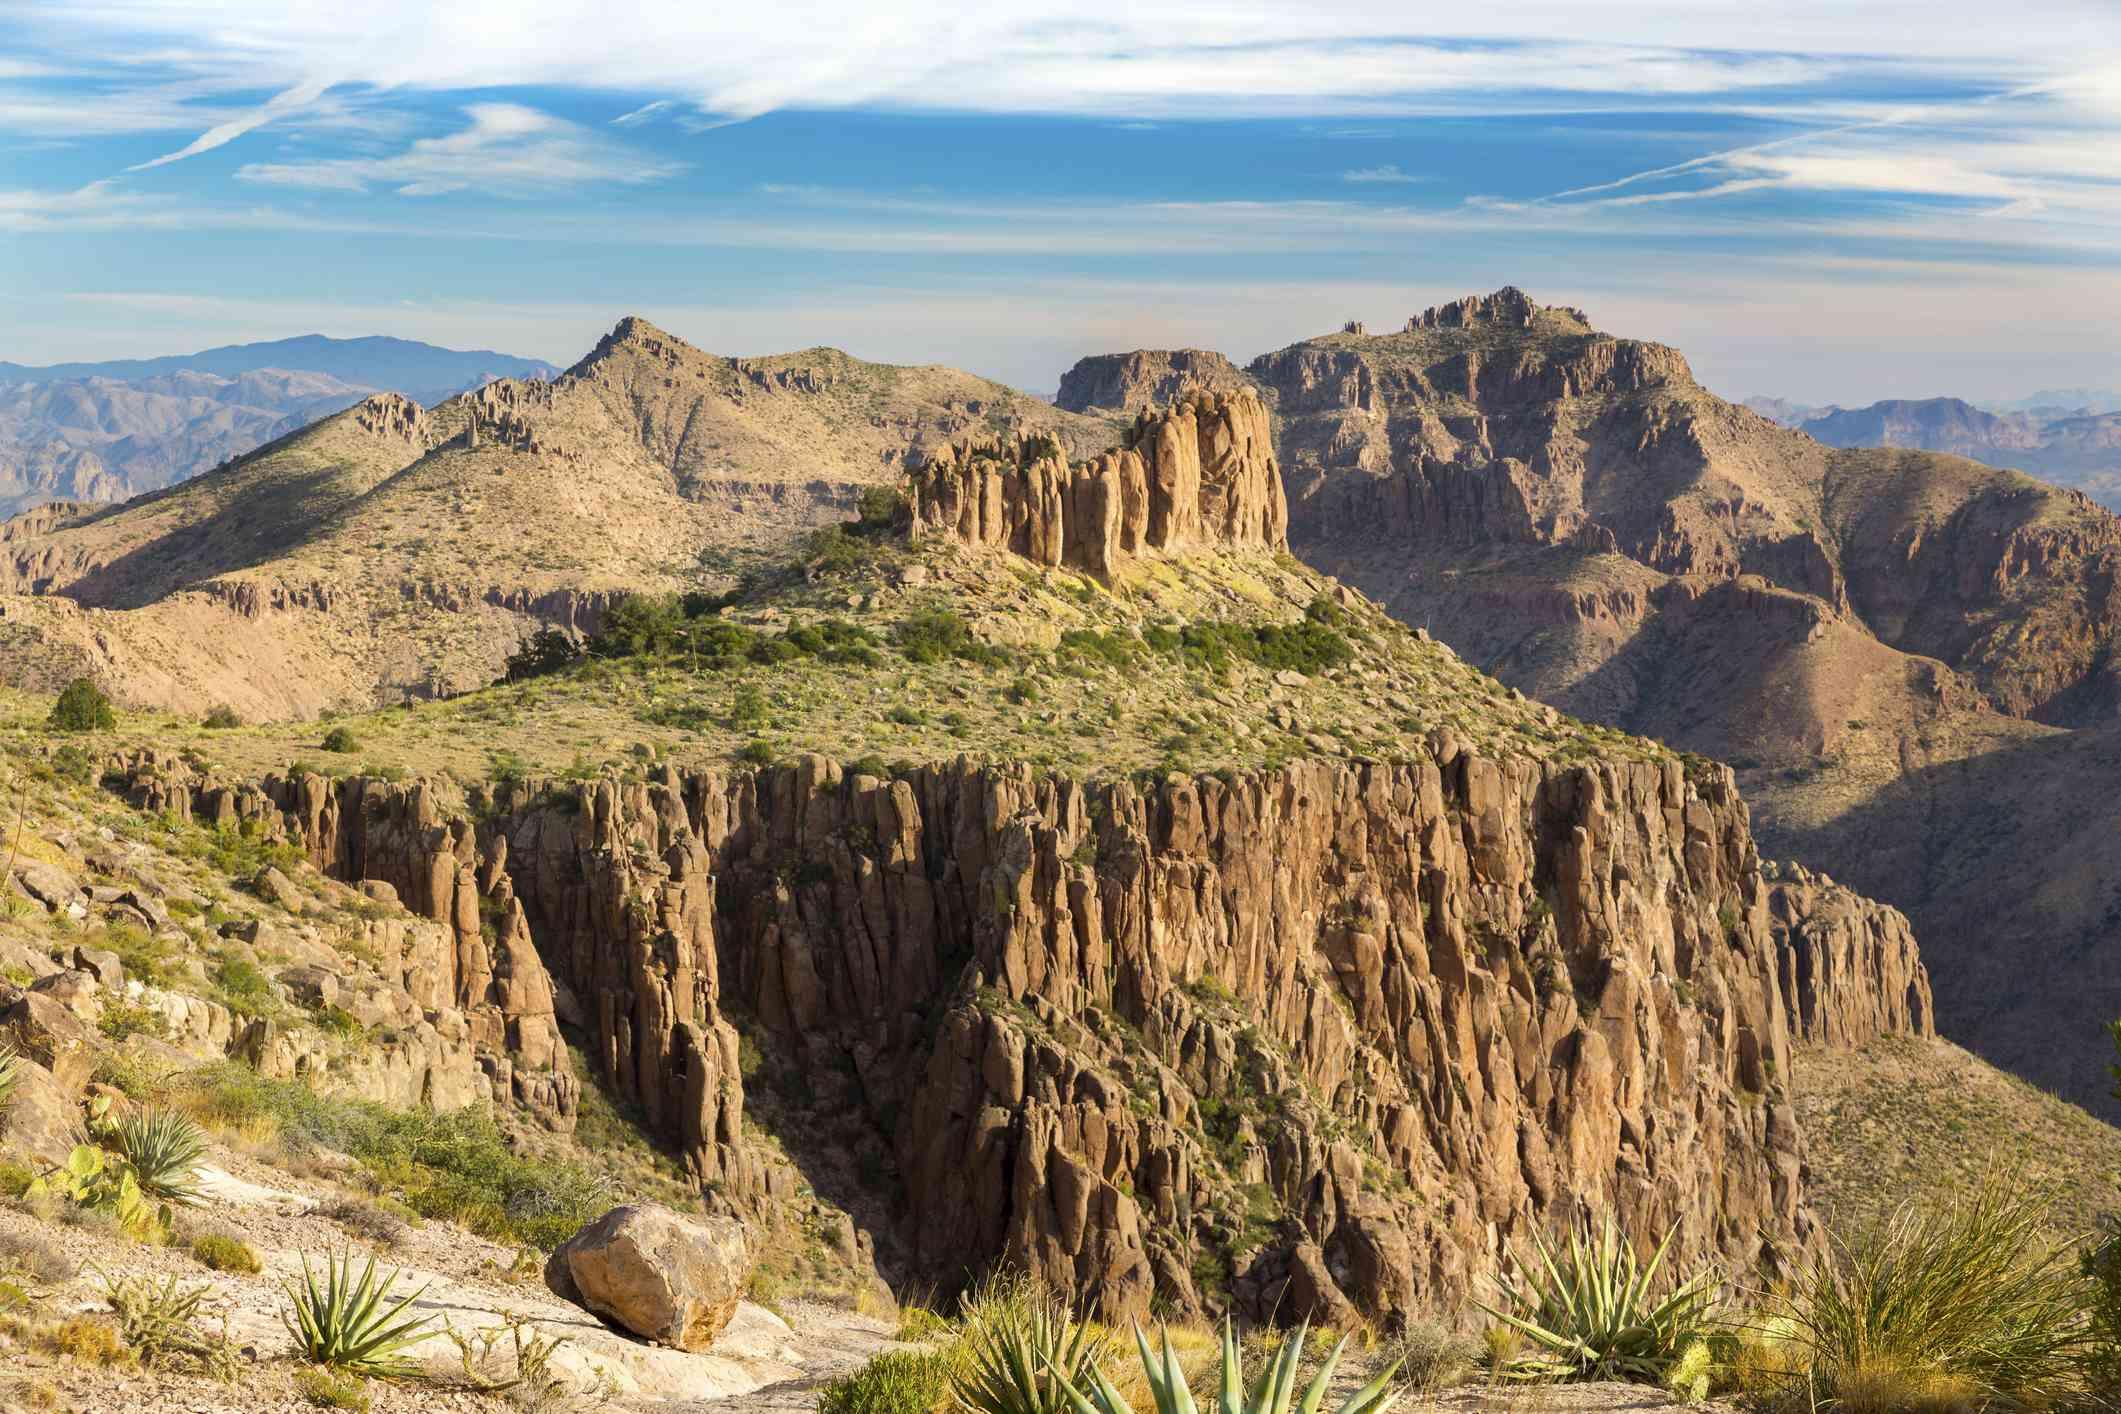 Superstition Mountains Landscape from Flatiron Peak east of Apache Junction near Phoenix Arizona